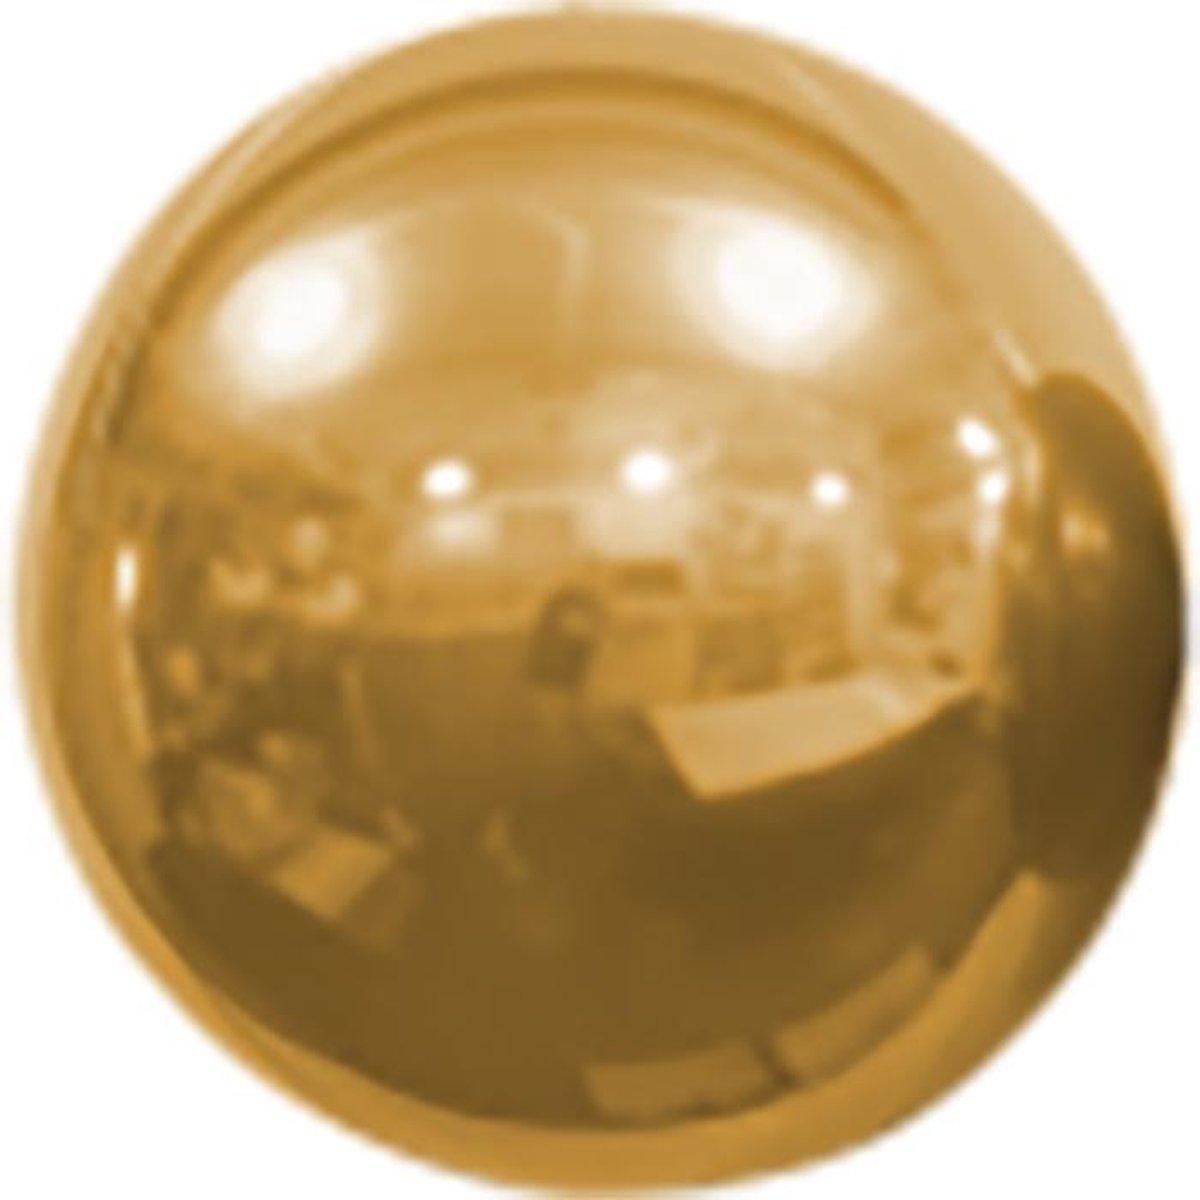 Folieballon Geel Spiegelend Rond 40 cm